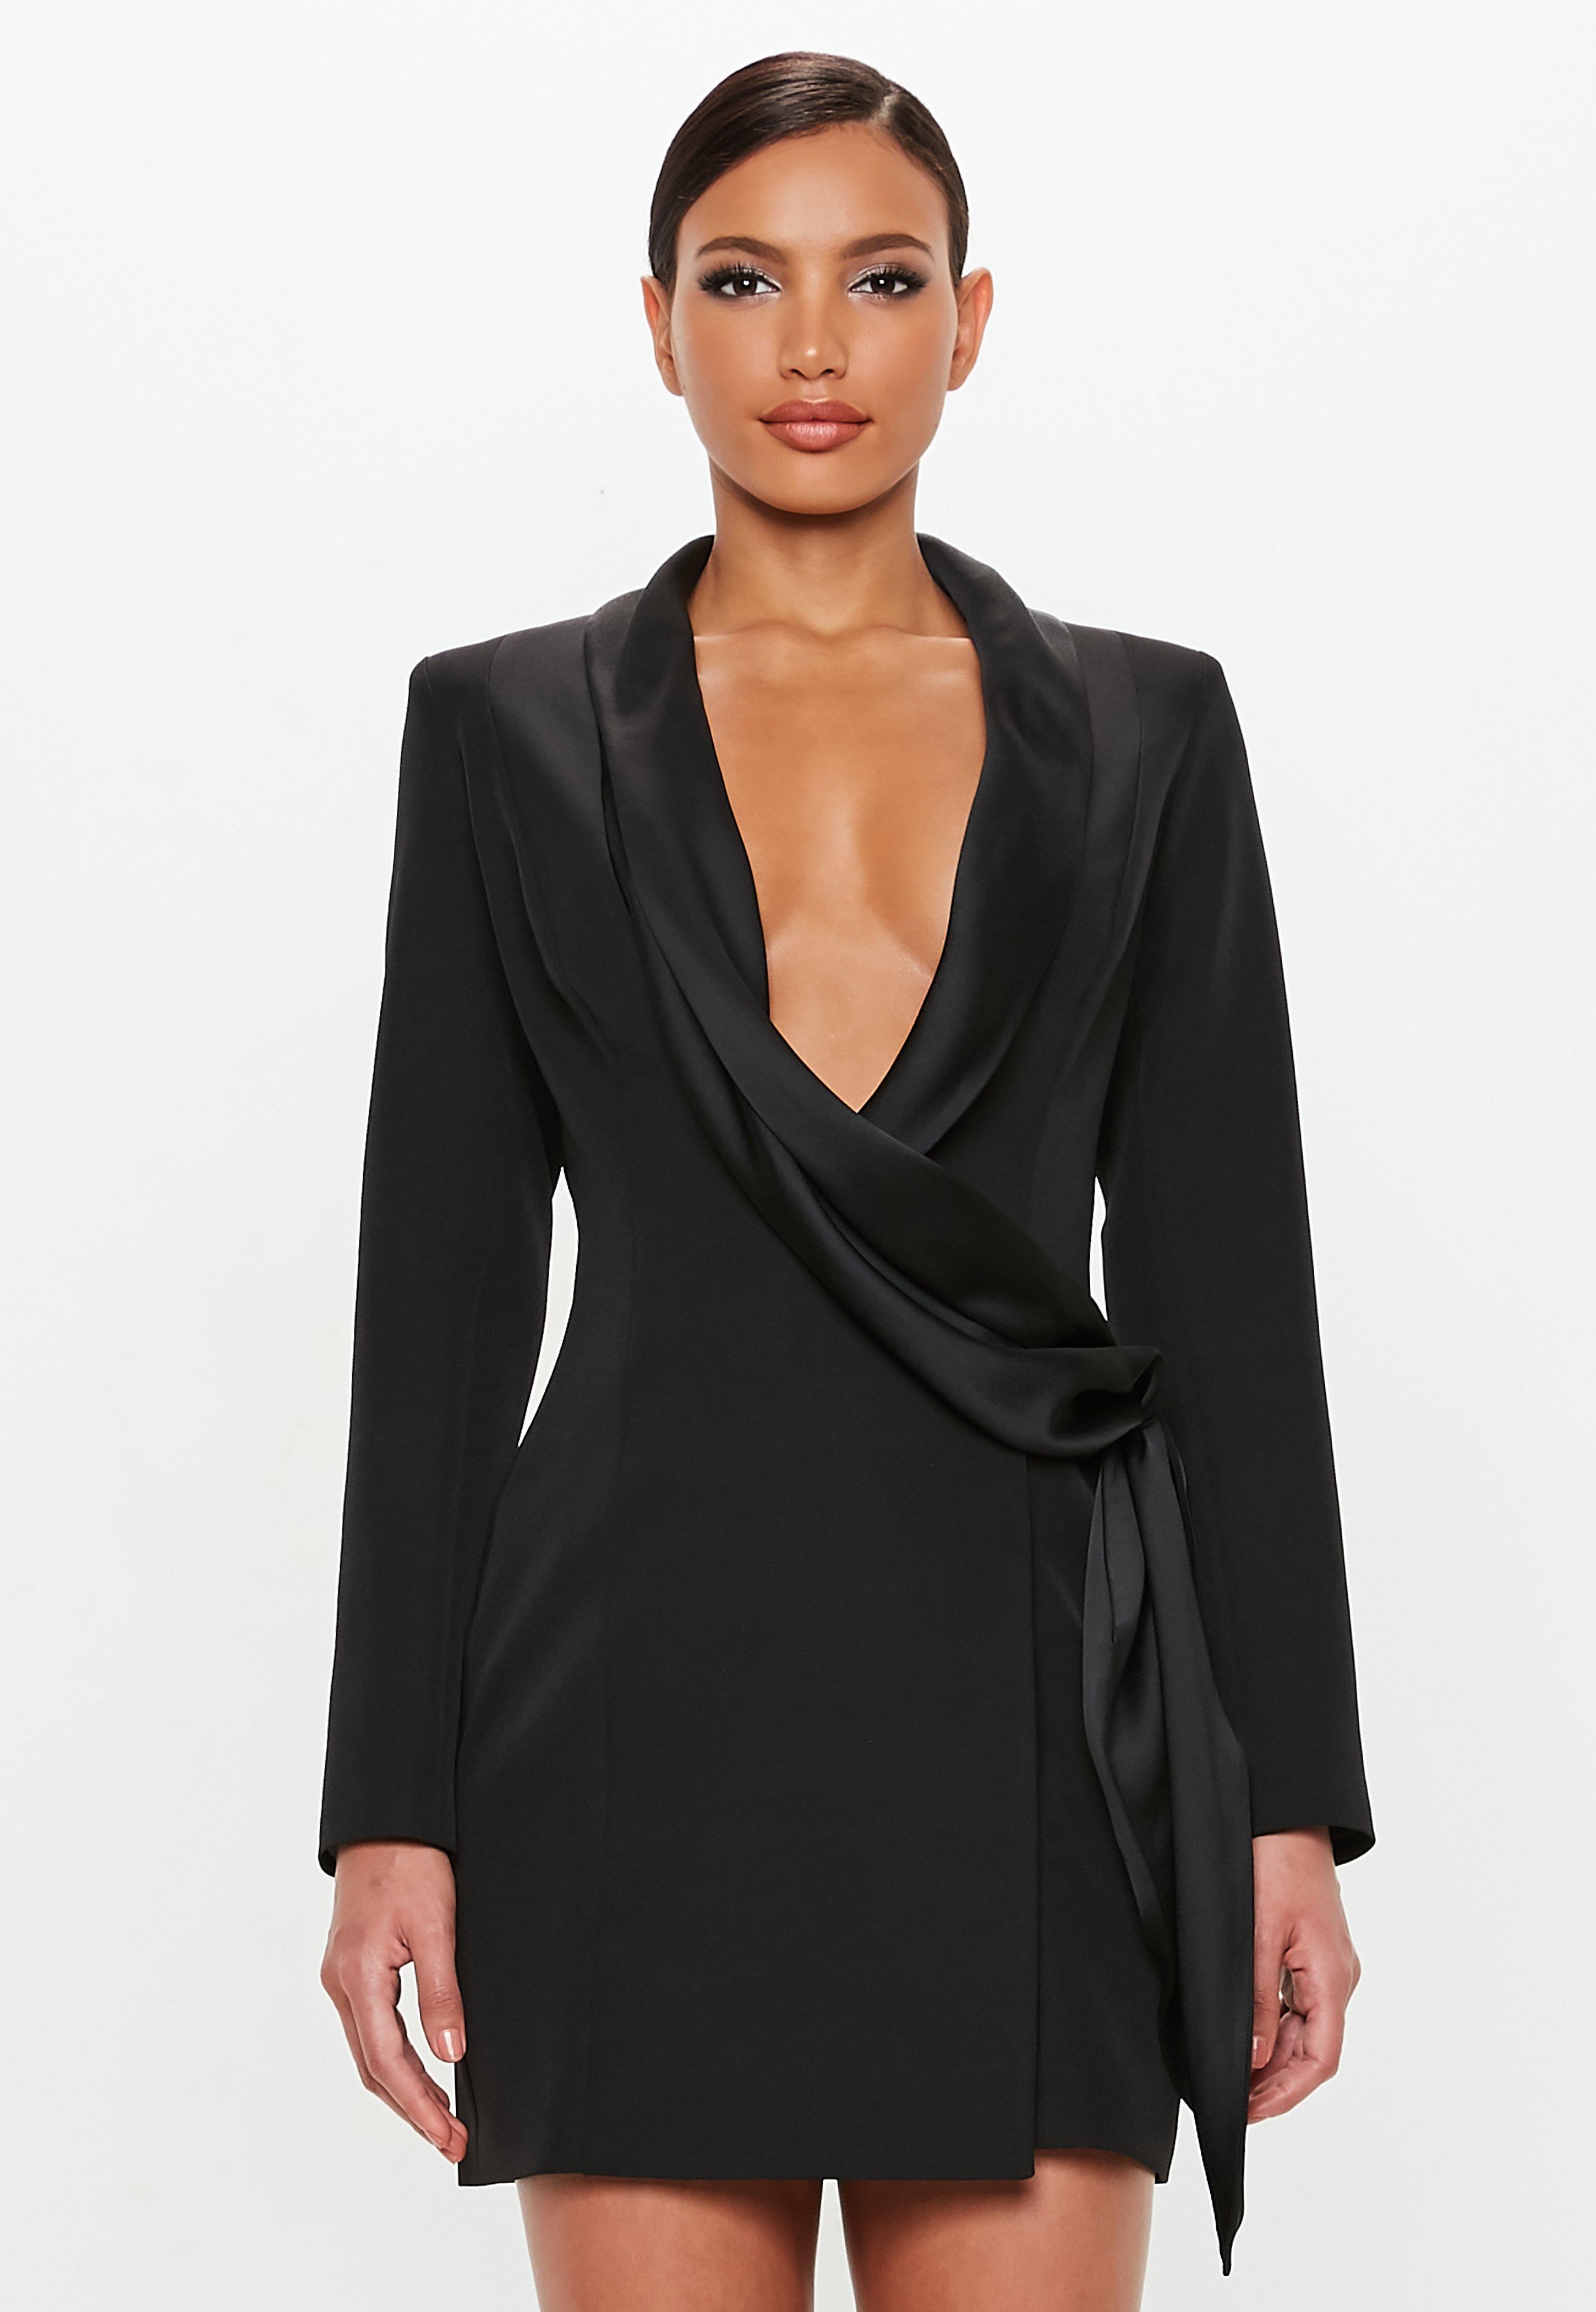 Vestido negro largo con blazer